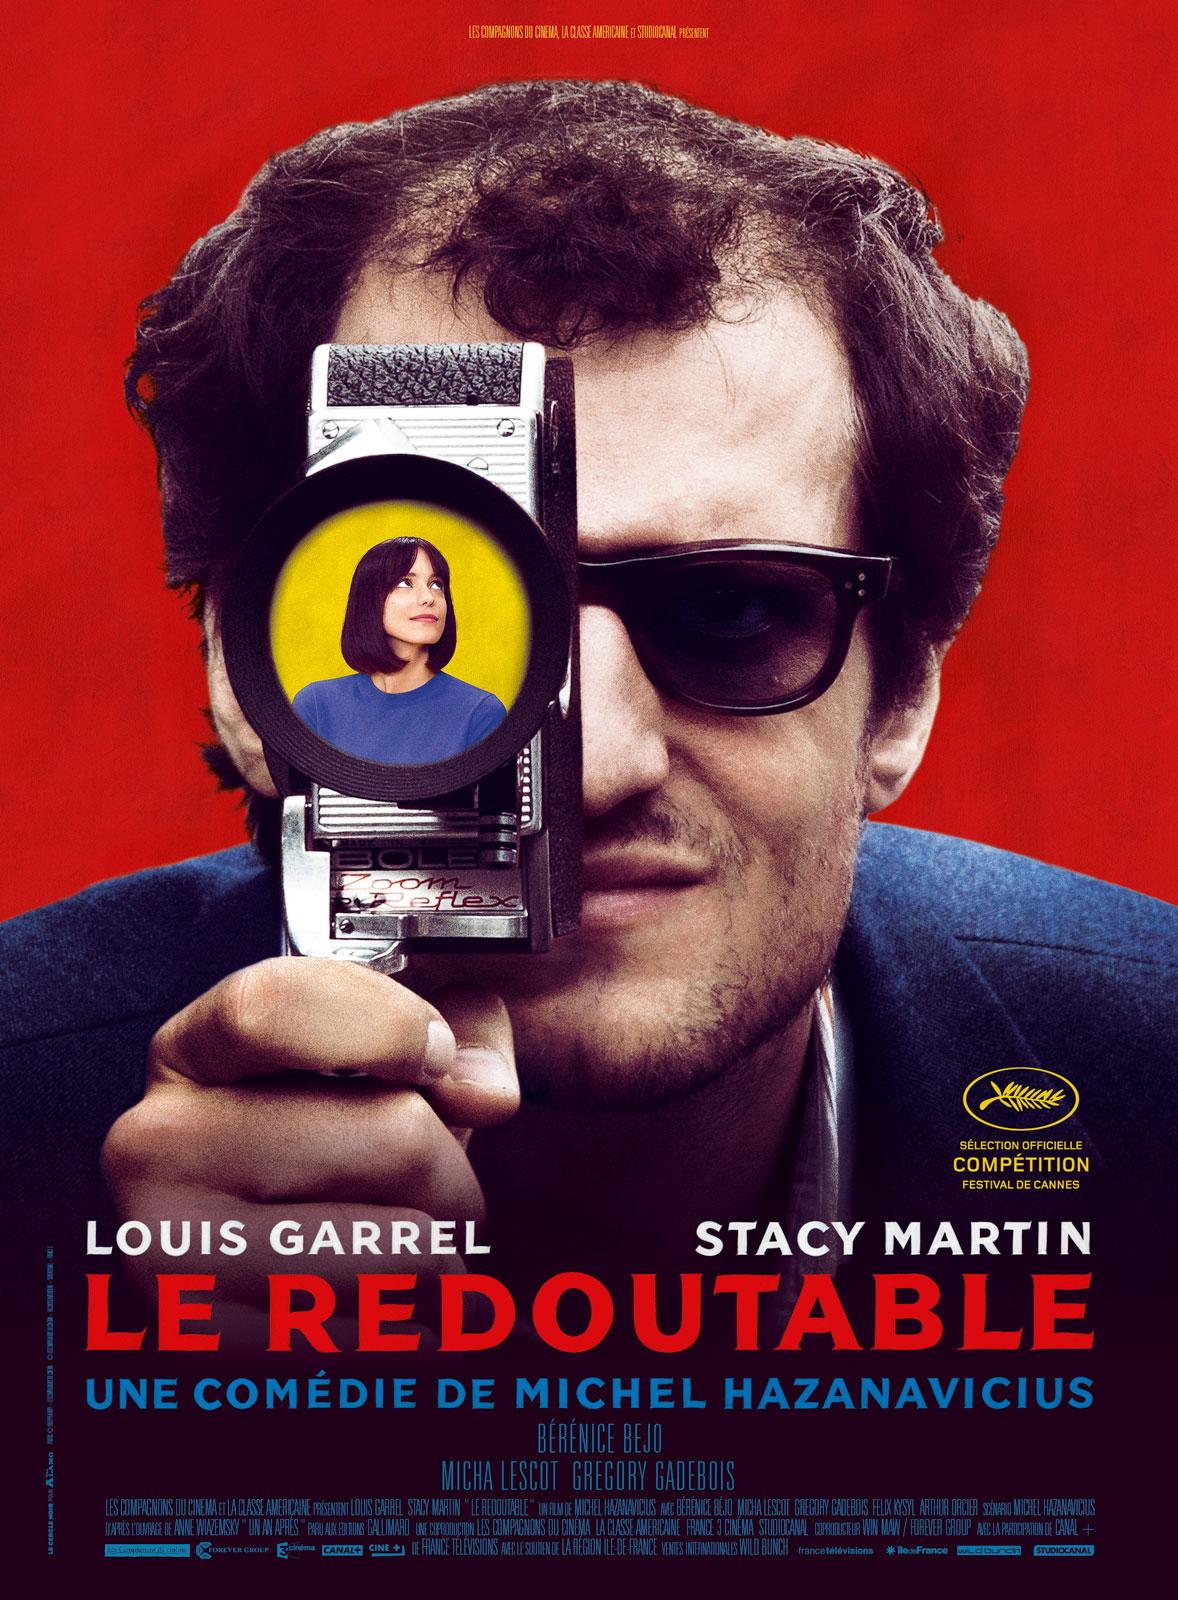 Le Redoutable (2017), Michel Hazanavicius